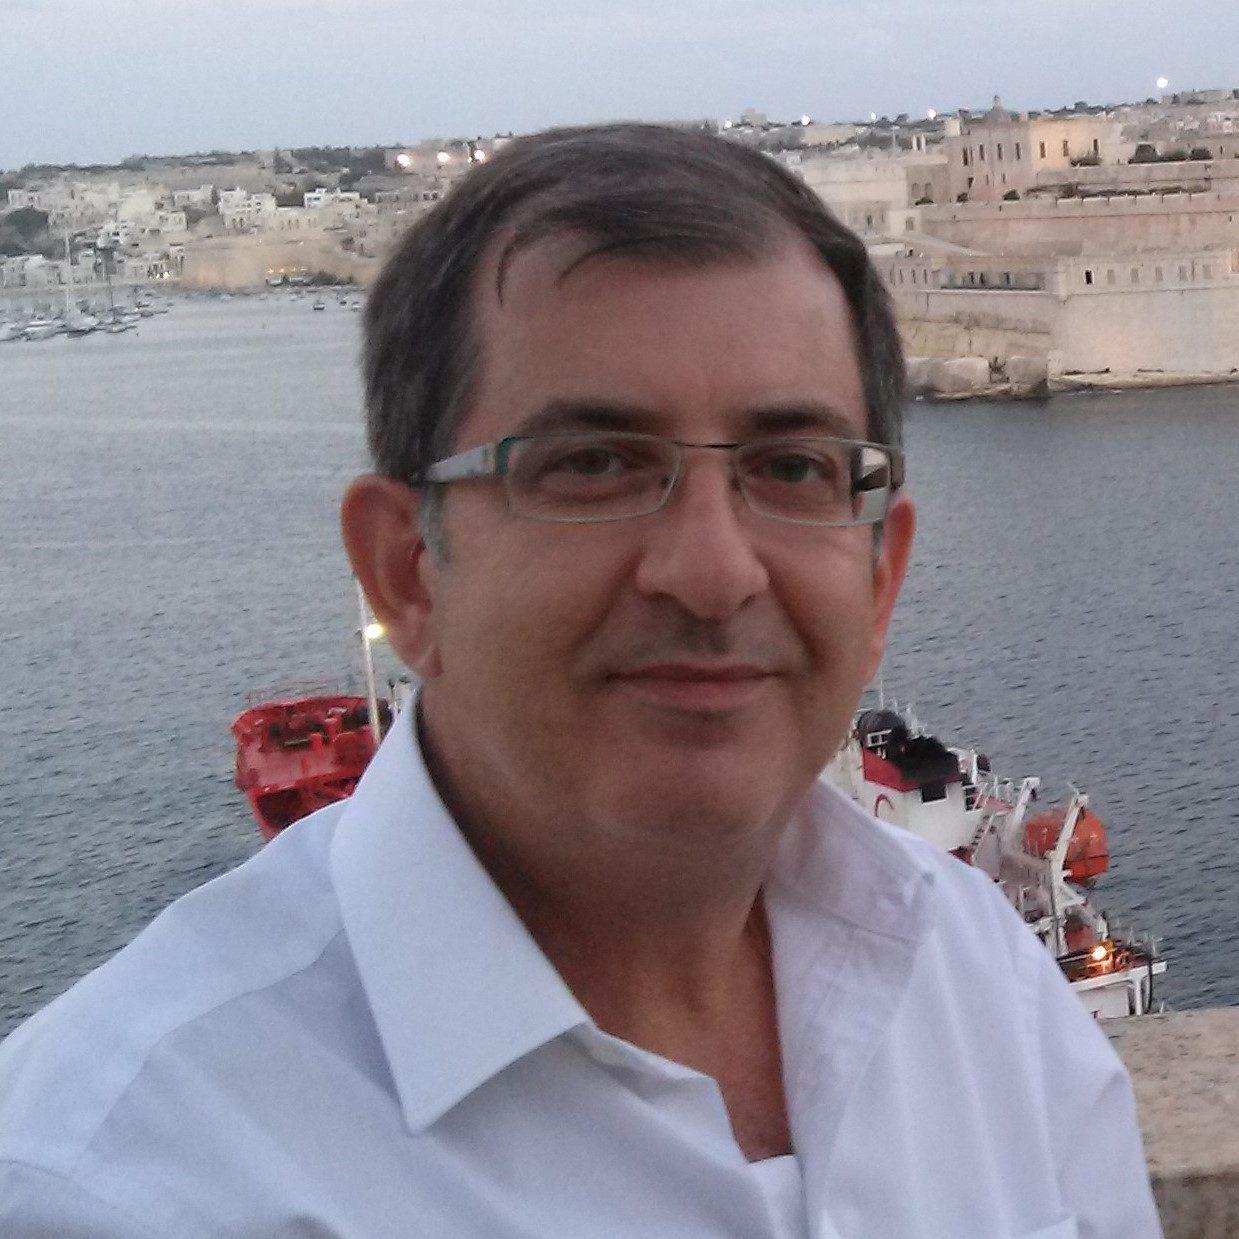 David Grech